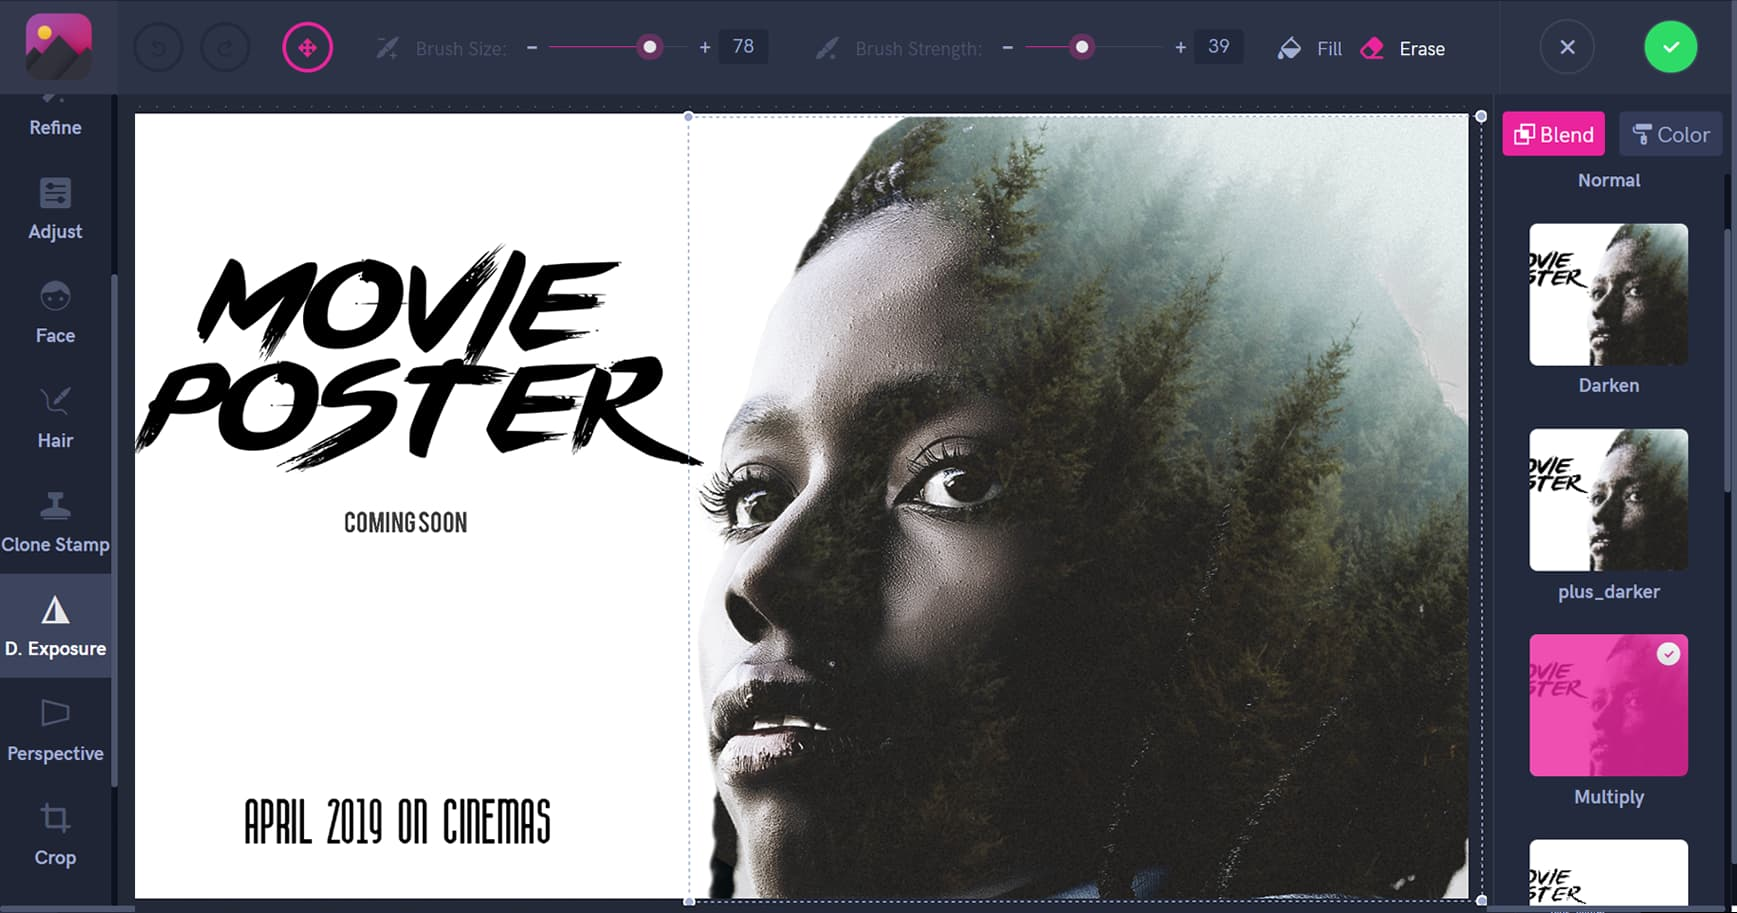 Movie poster creation using Double Exposure technique